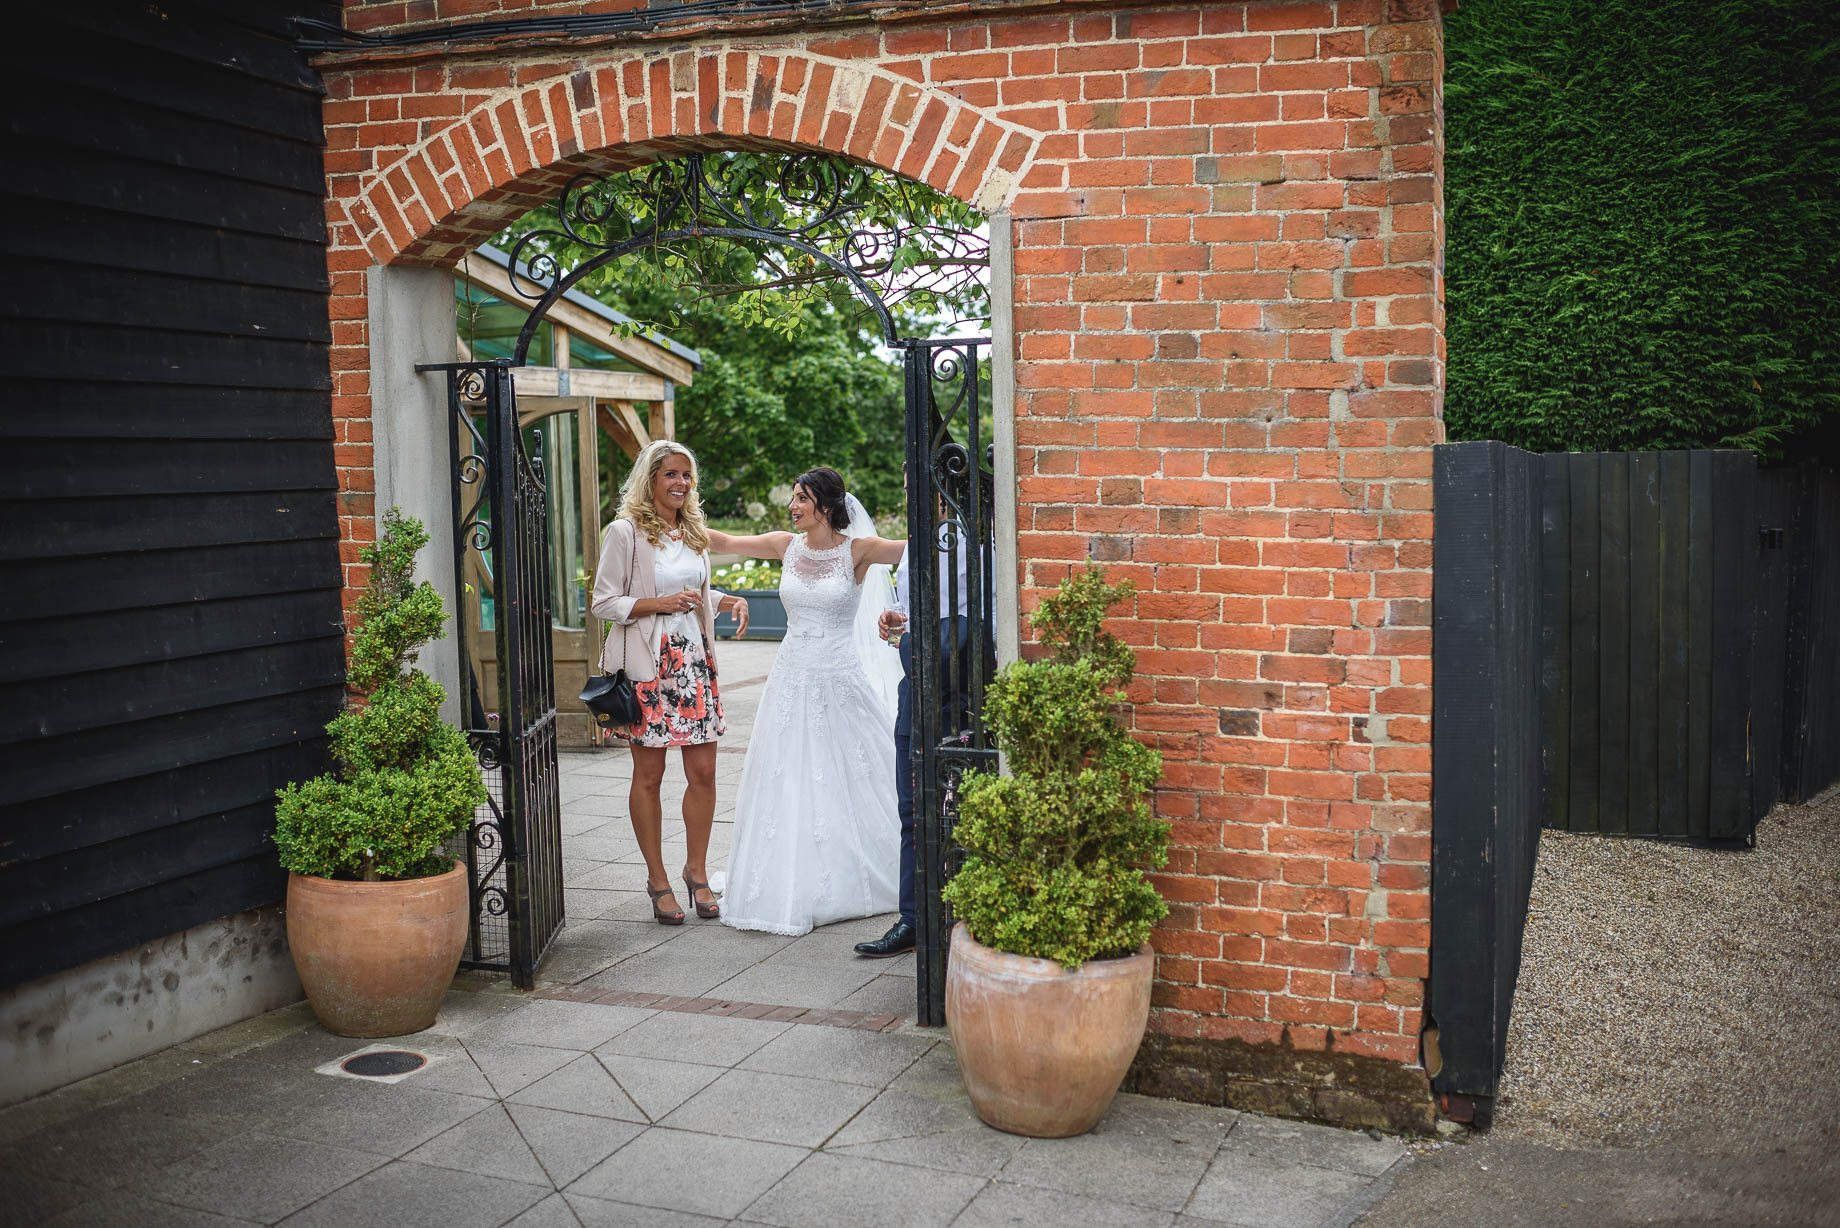 Gaynes Park wedding photography - Guy Collier Photography - Rachel and Jon (107 of 169)